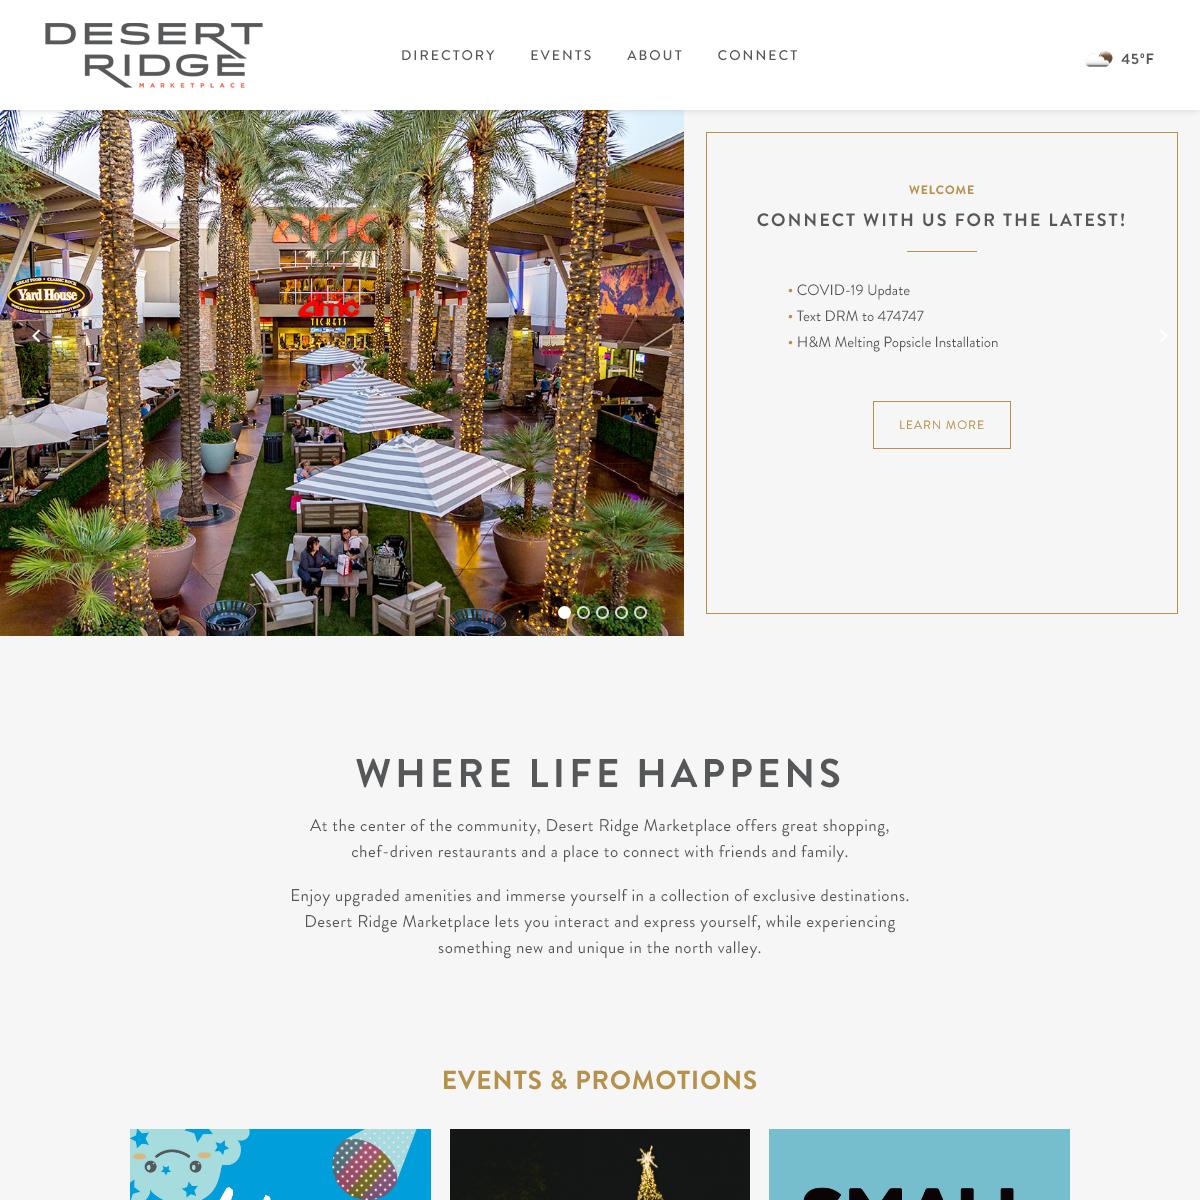 Desert Ridge Marketplace - Where Life Happens